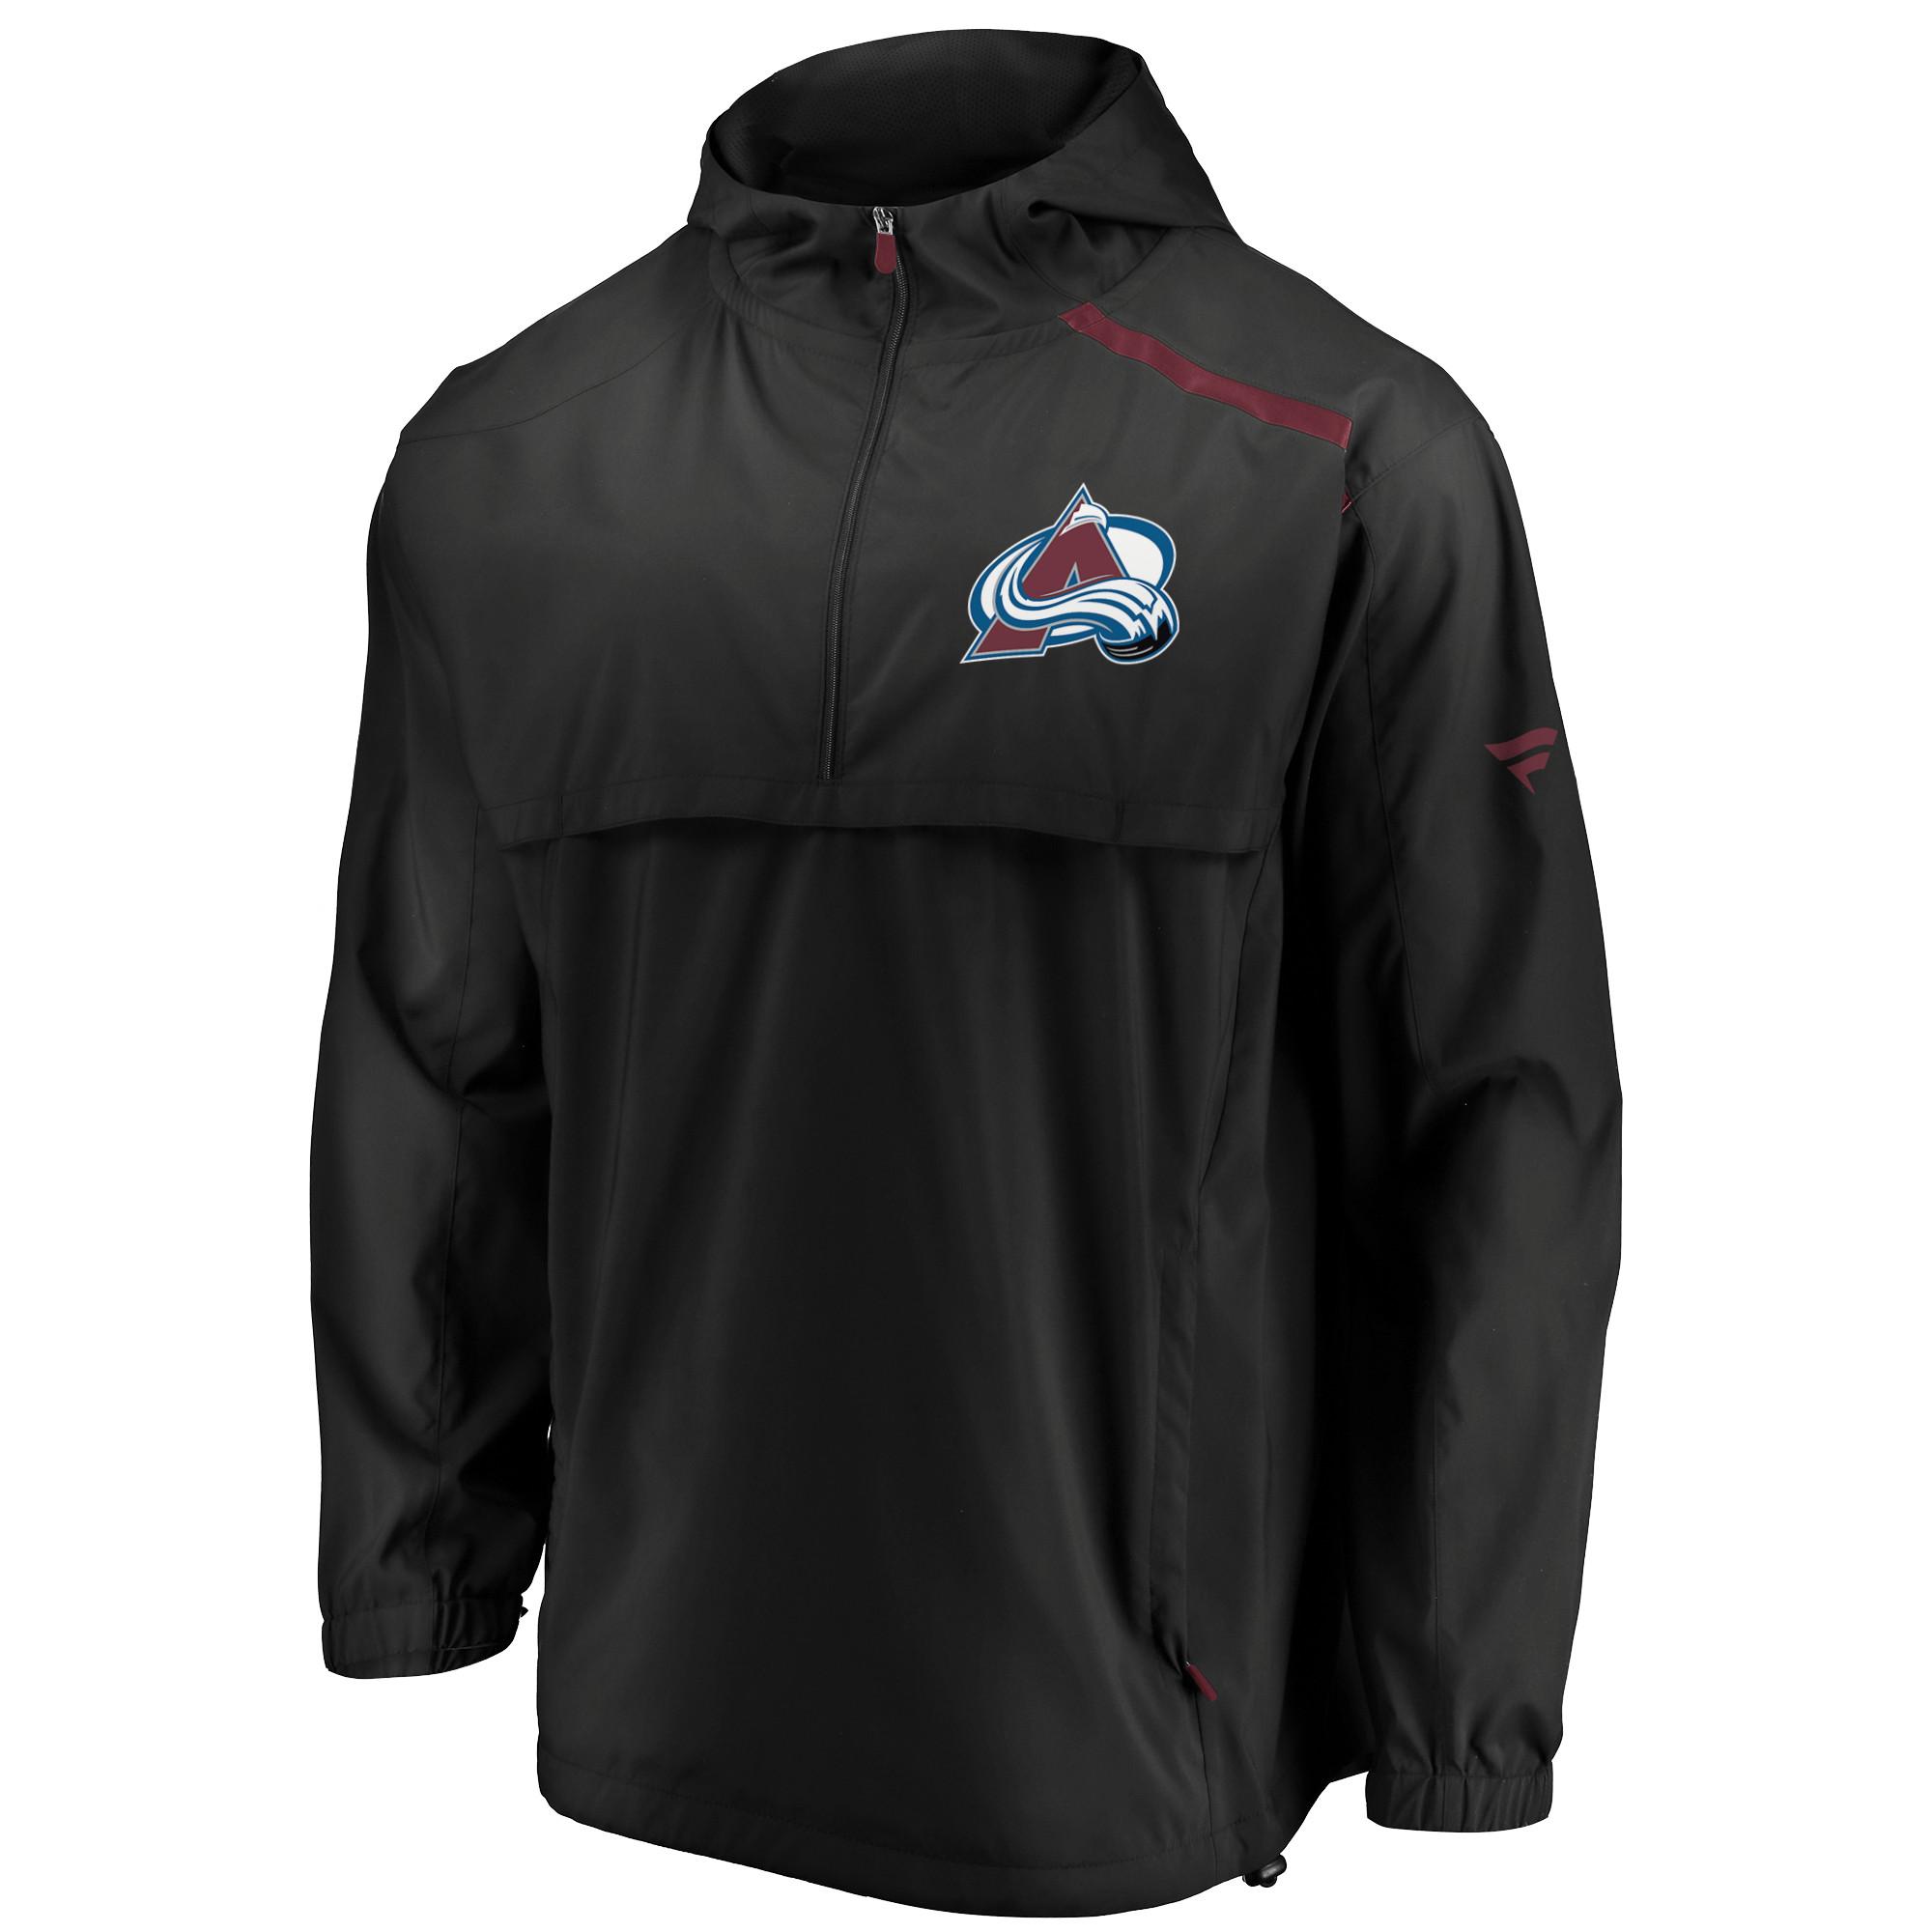 4db767085da Colorado Avalanche Fanatics Branded Authentic Pro Rinkside Anorak 1 4-Zip  Jacket - Black - Walmart.com